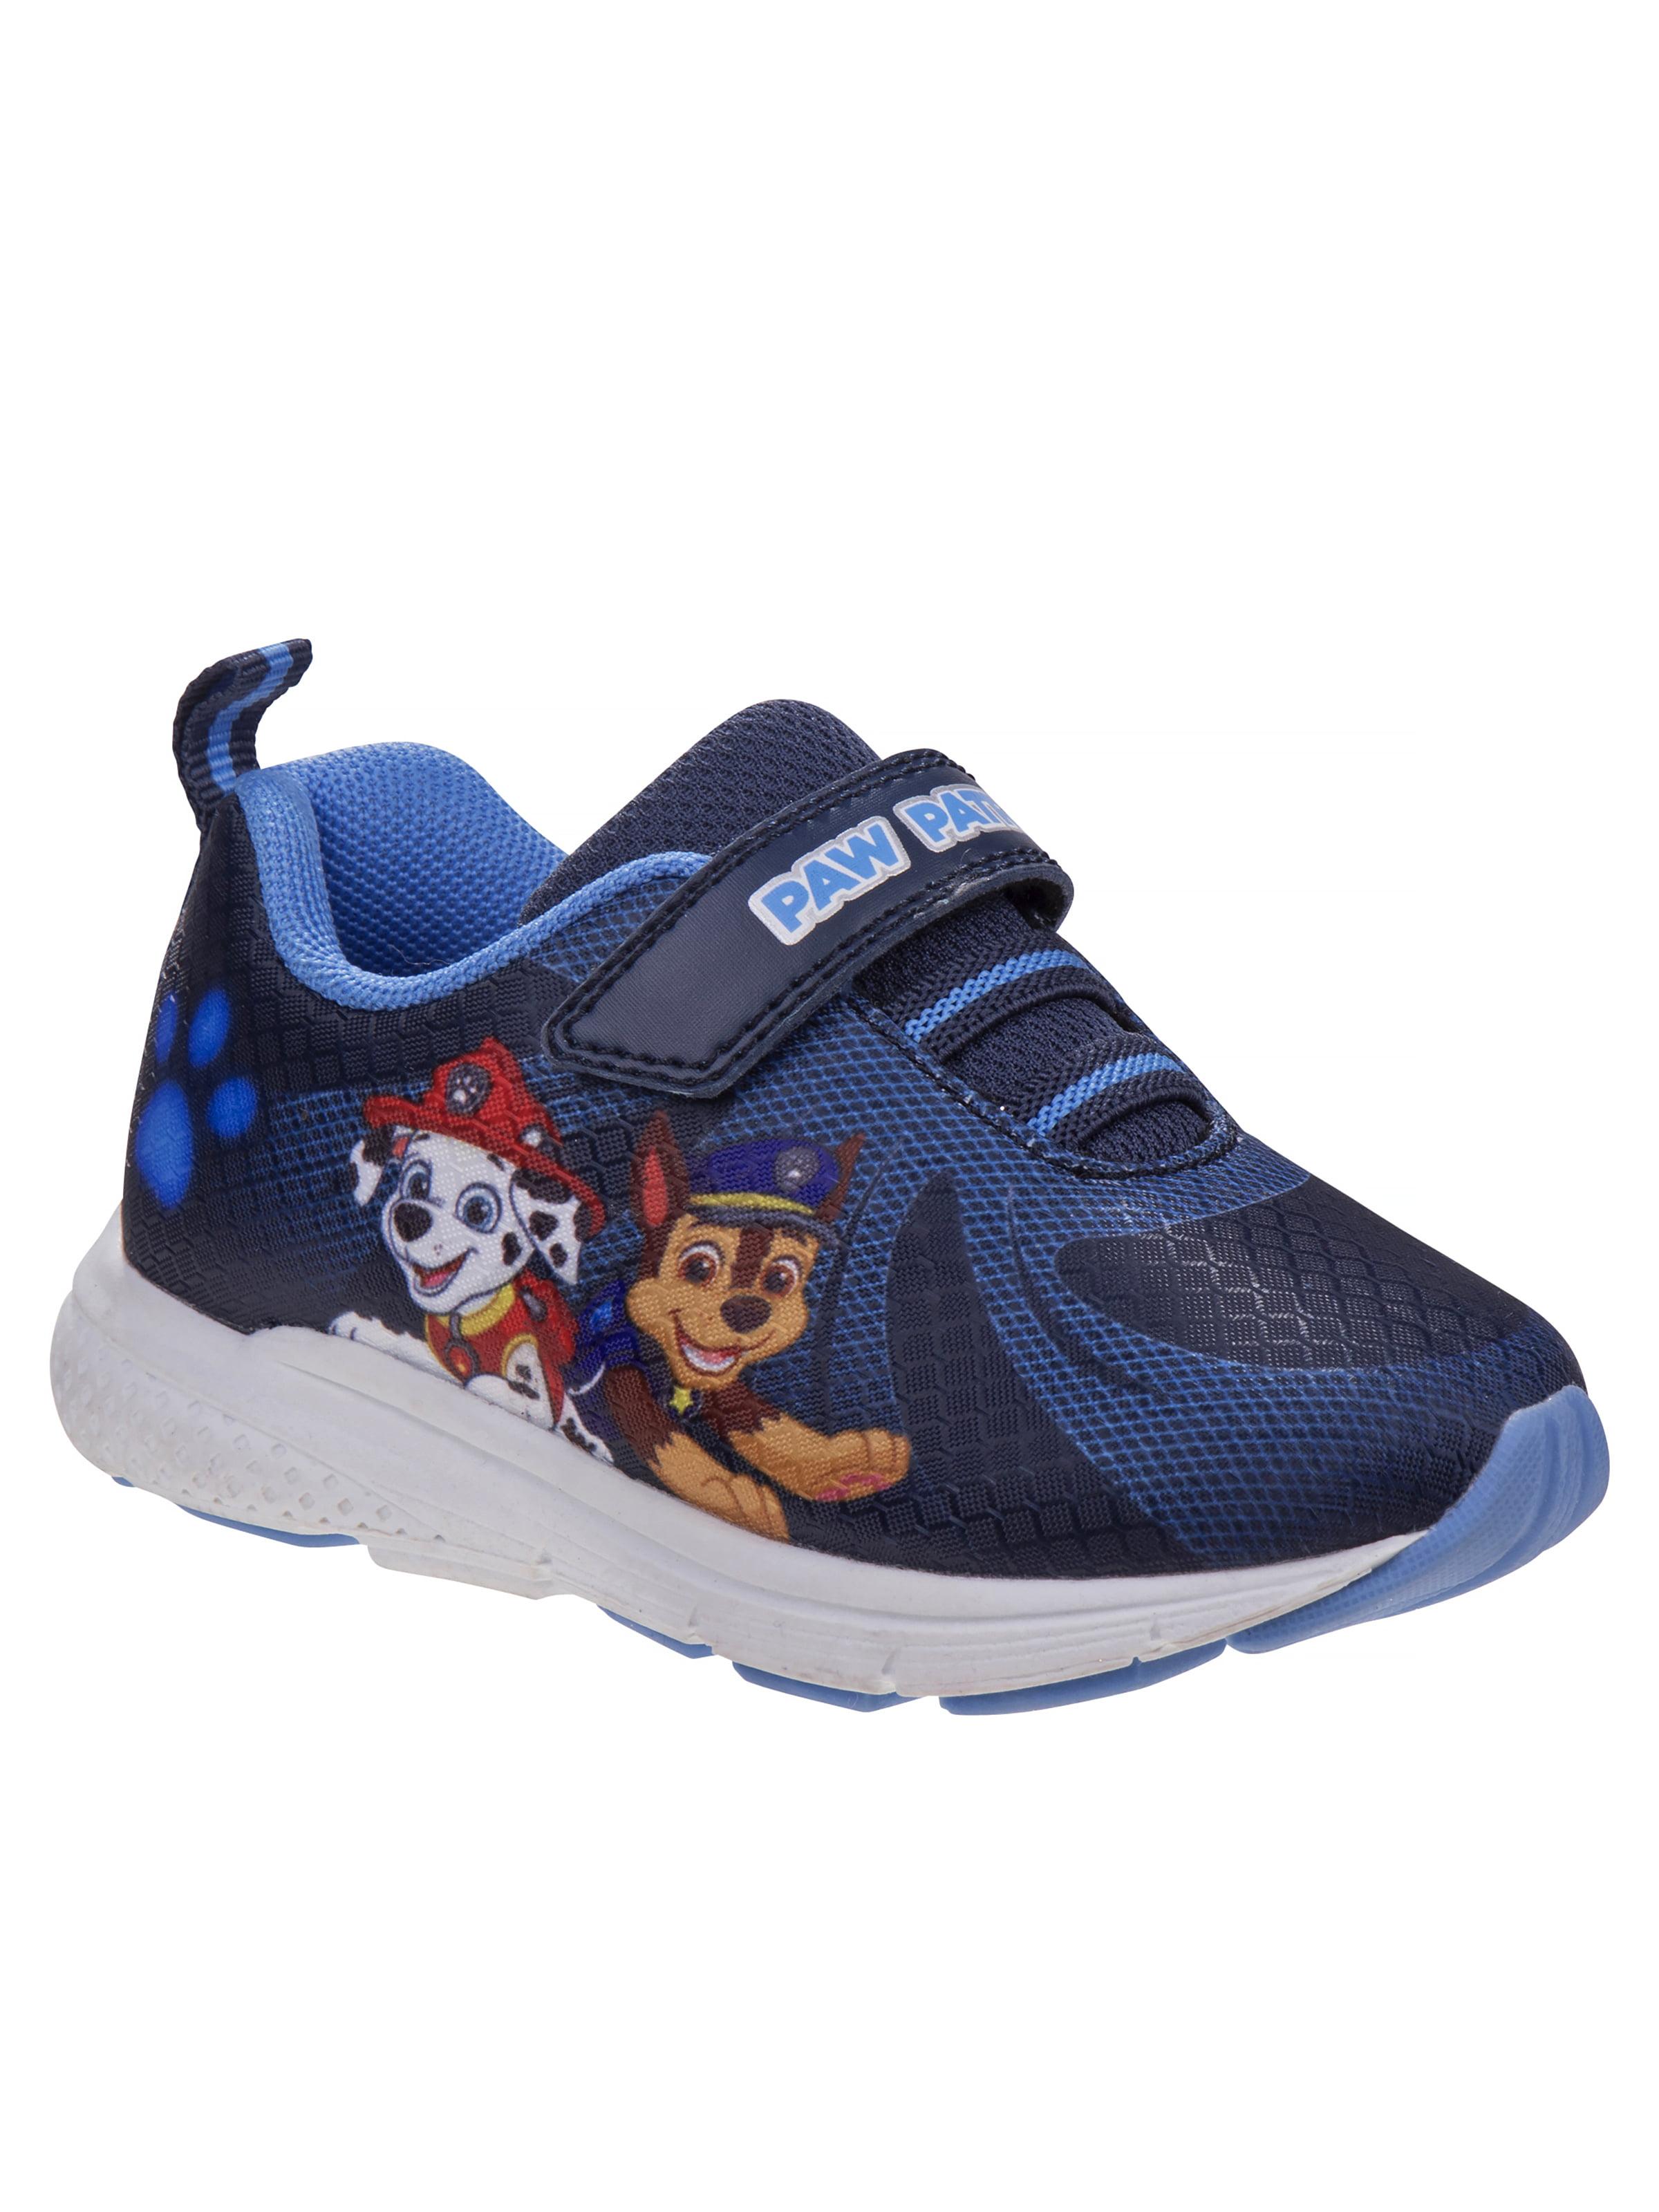 PAW Patrol Boys' Athletic Sneaker Shoe